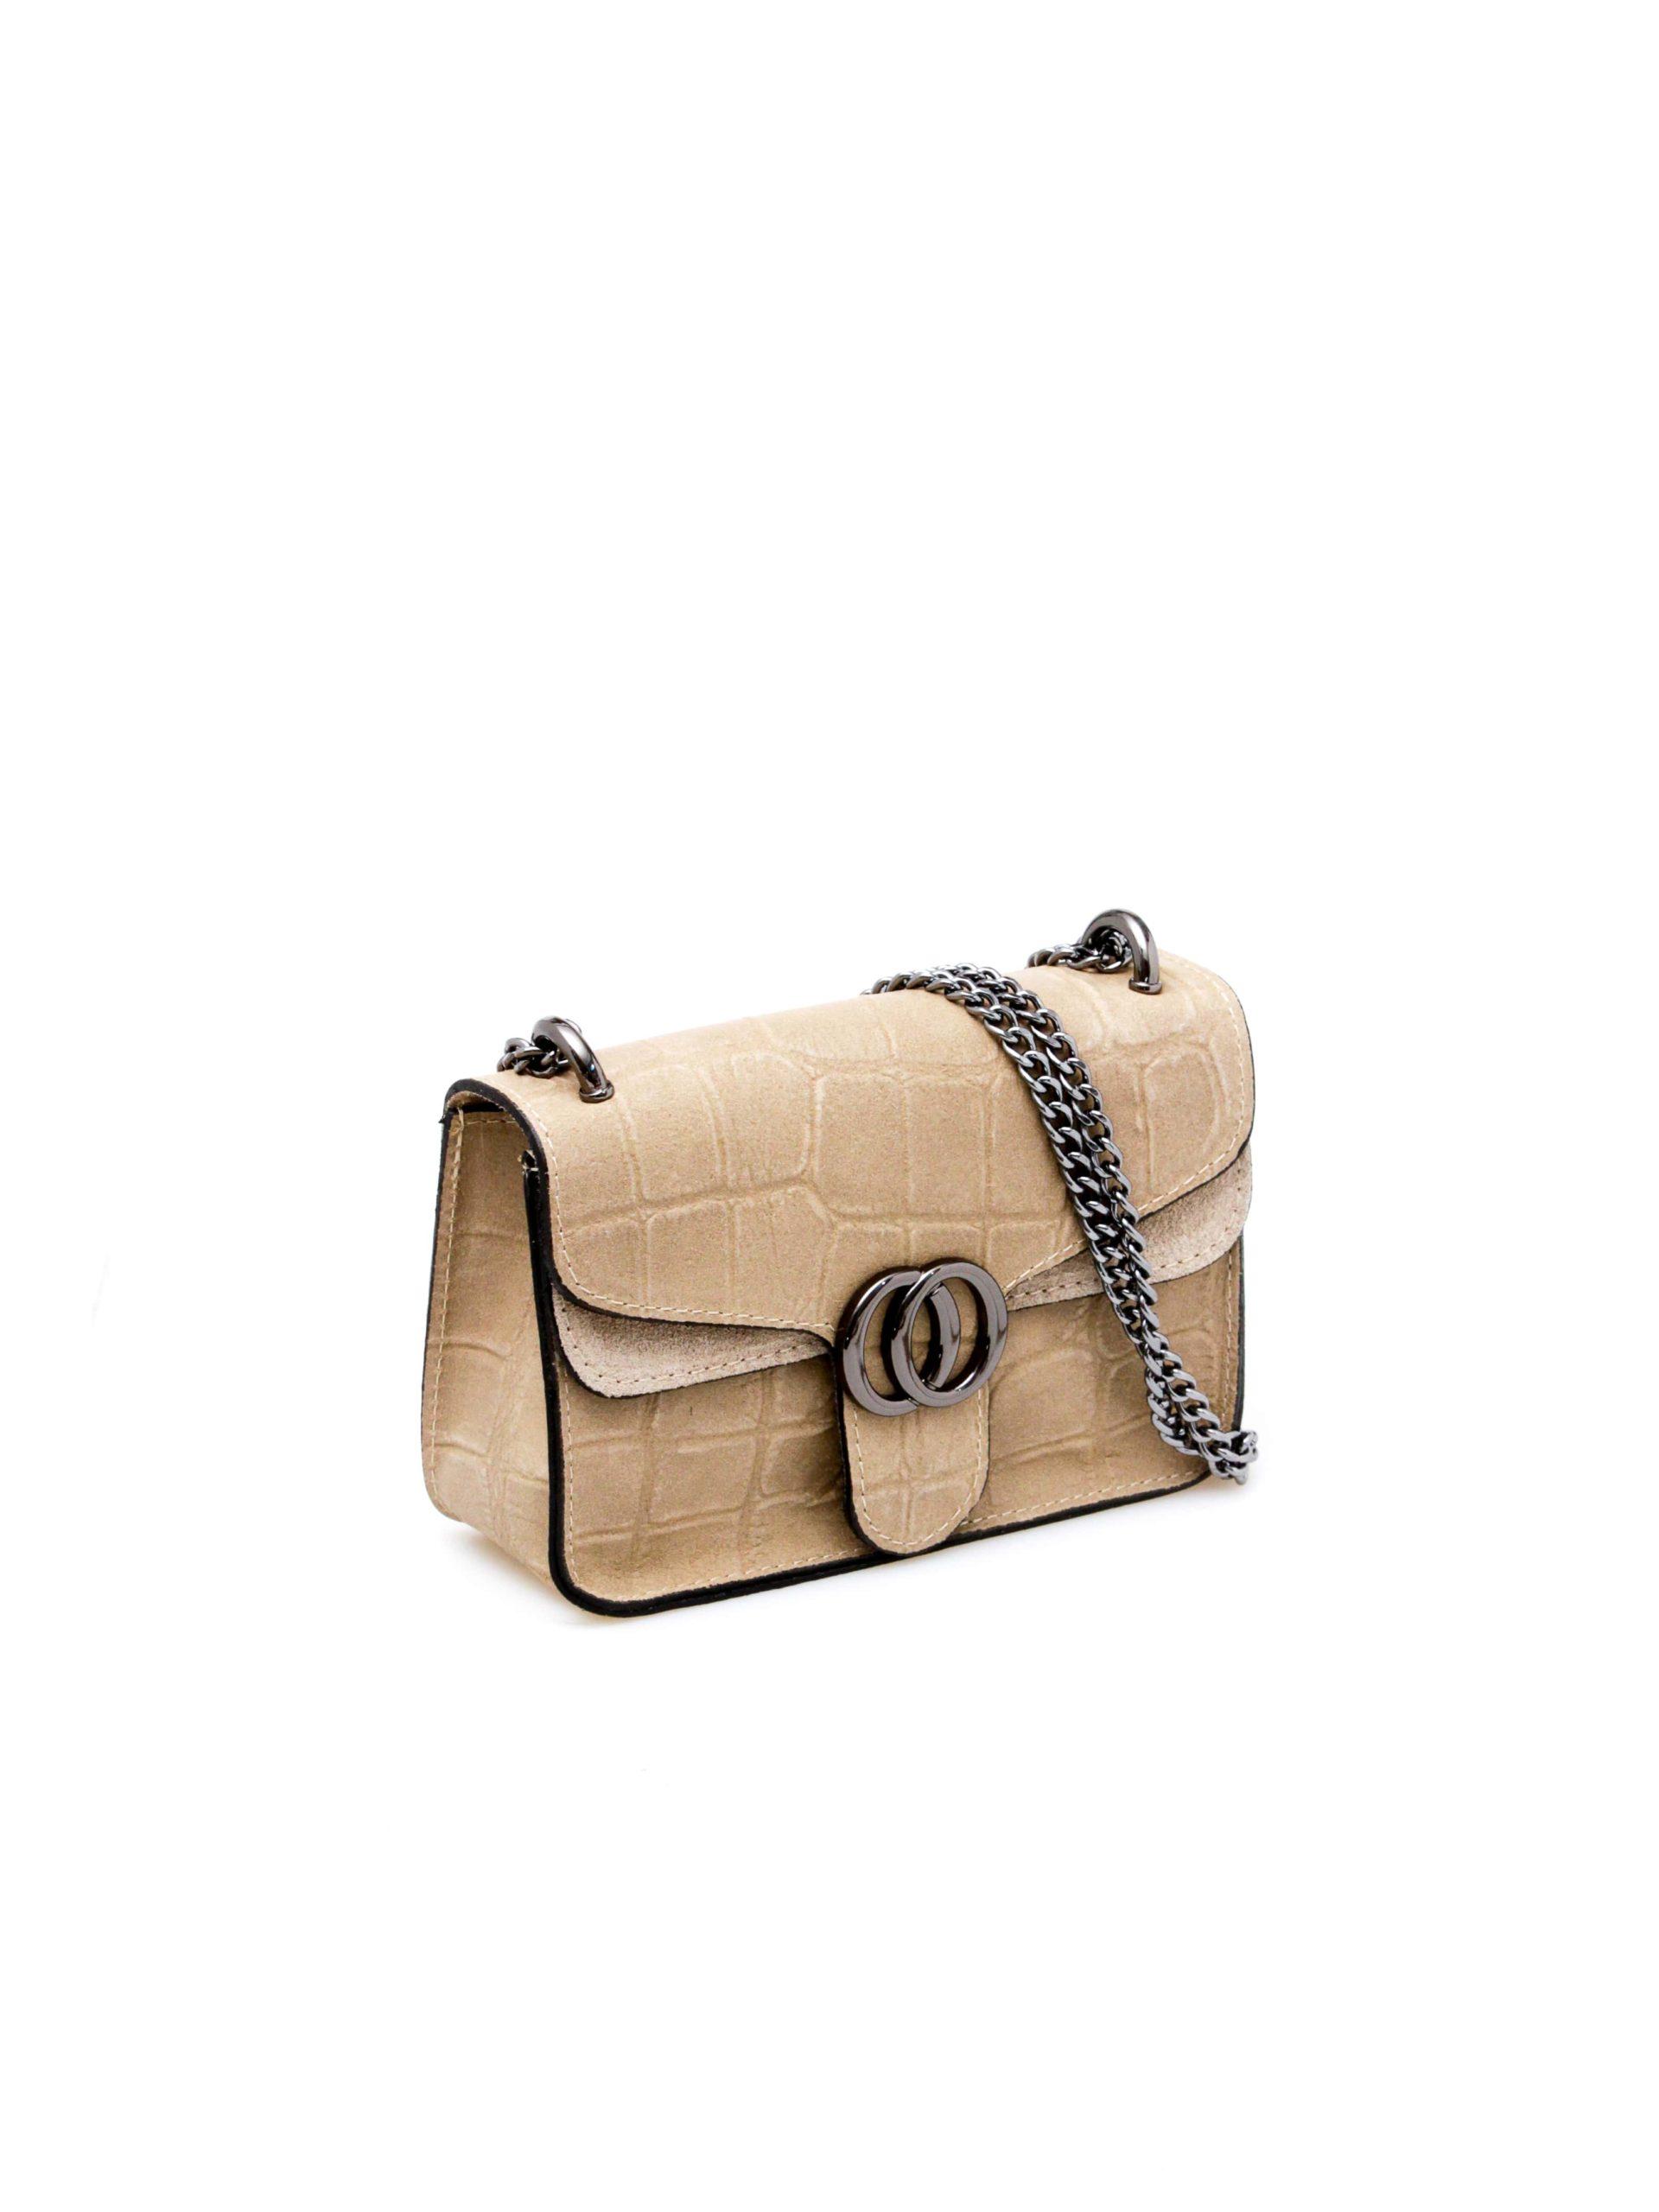 женская сумочка бежевая